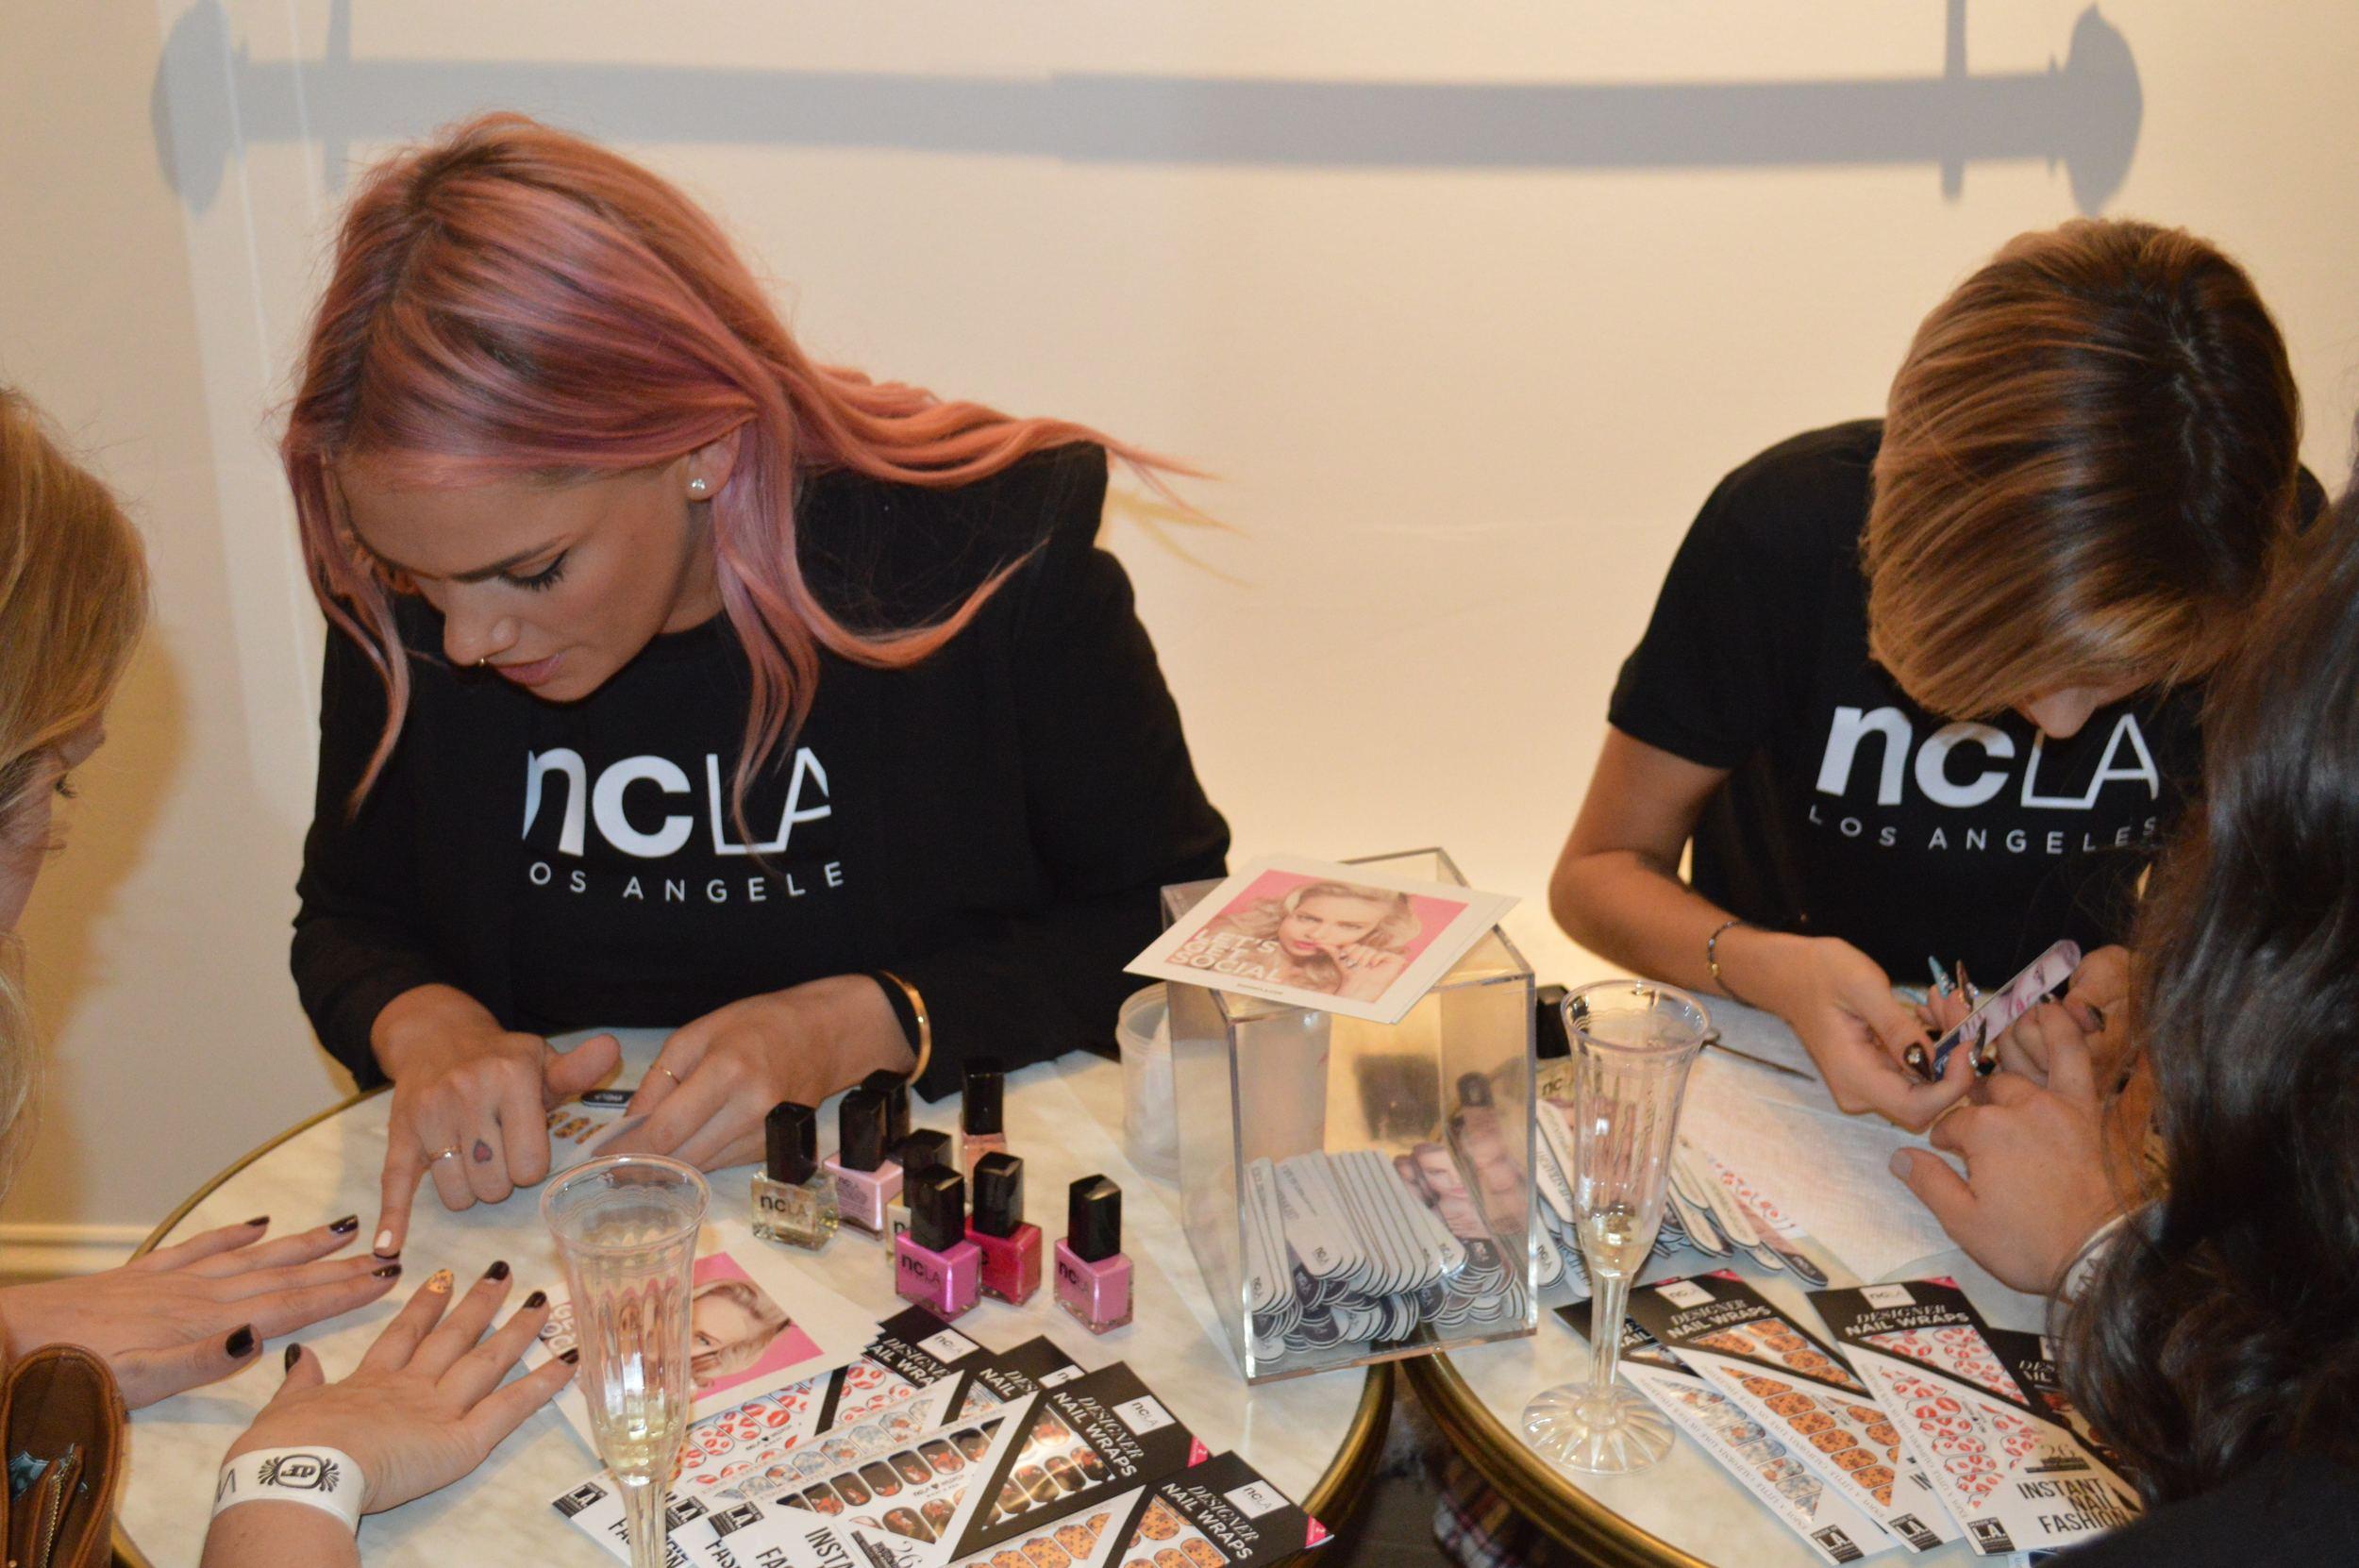 NCLA copy.jpg